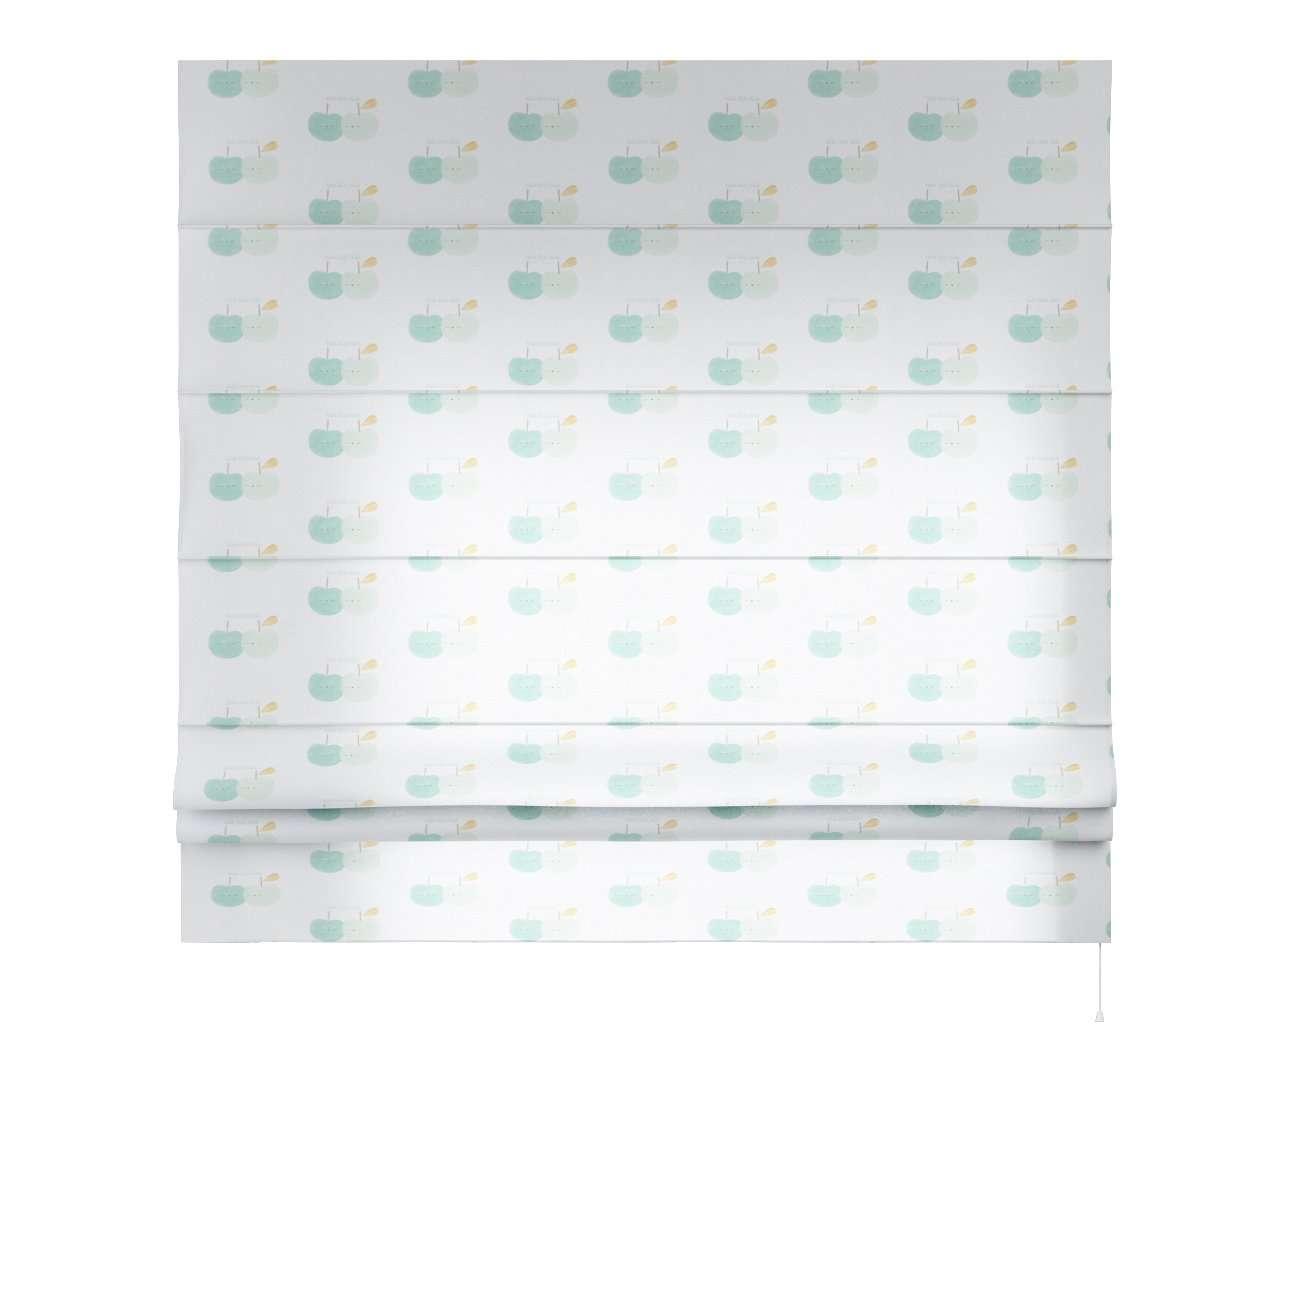 Foldegardin Paris<br/>Med lige flæse 80 x 170 cm fra kollektionen Apanona, Stof: 151-02